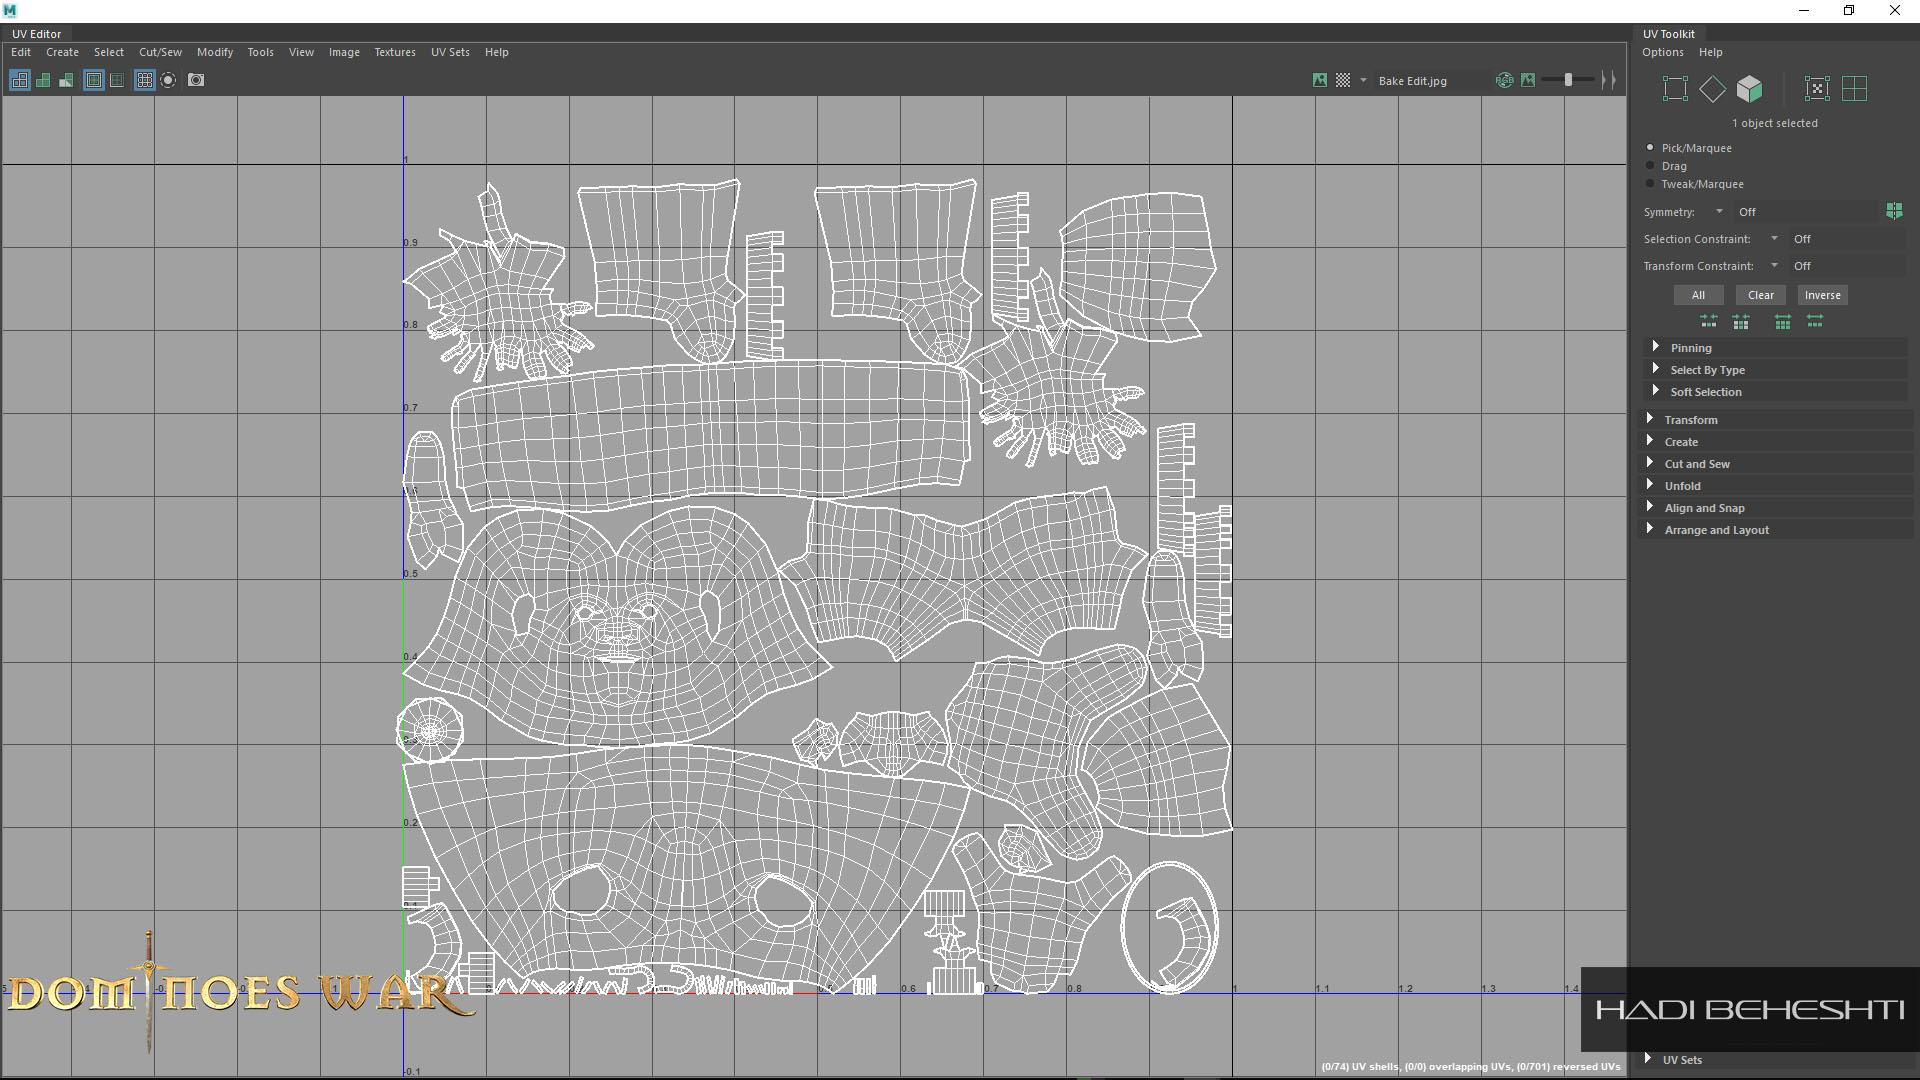 Dominoes War Game Character Optimition Hadi Beheshti CG Artist-1